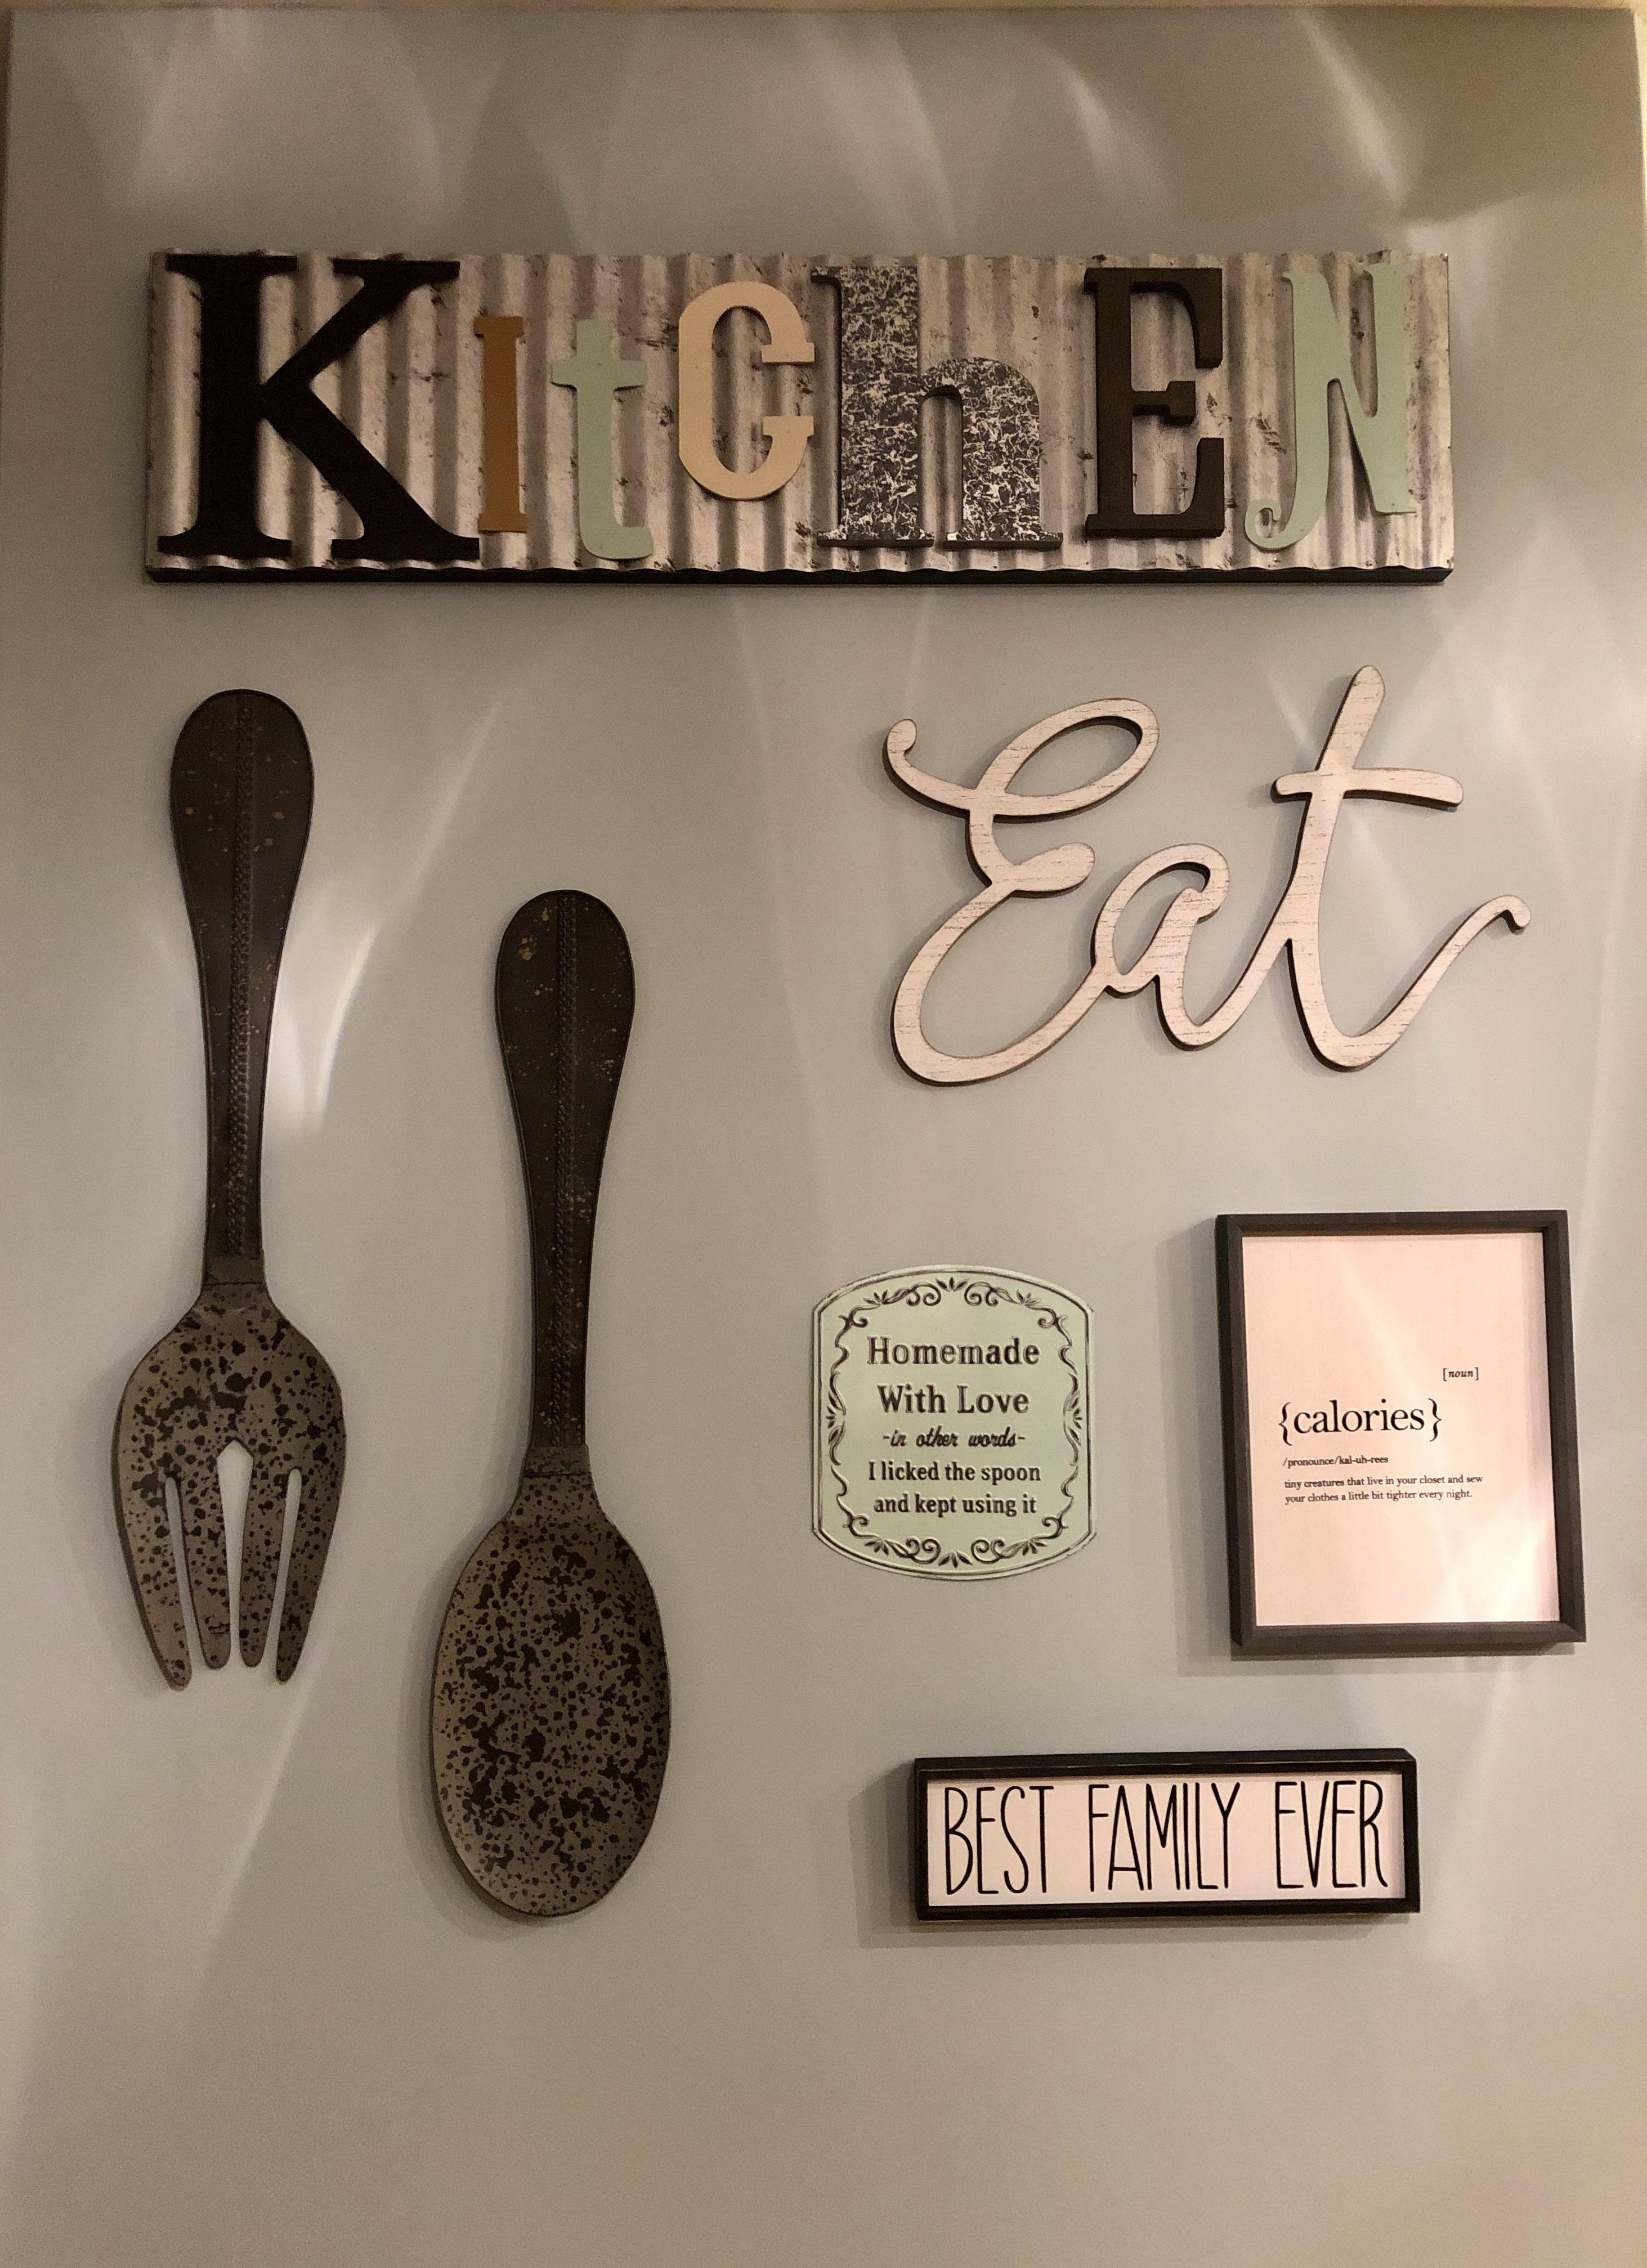 Kitchen Wall Decor Kitchen Decor Wall Art Hobby Lobby Wall Decor Kitchen Wall Decor